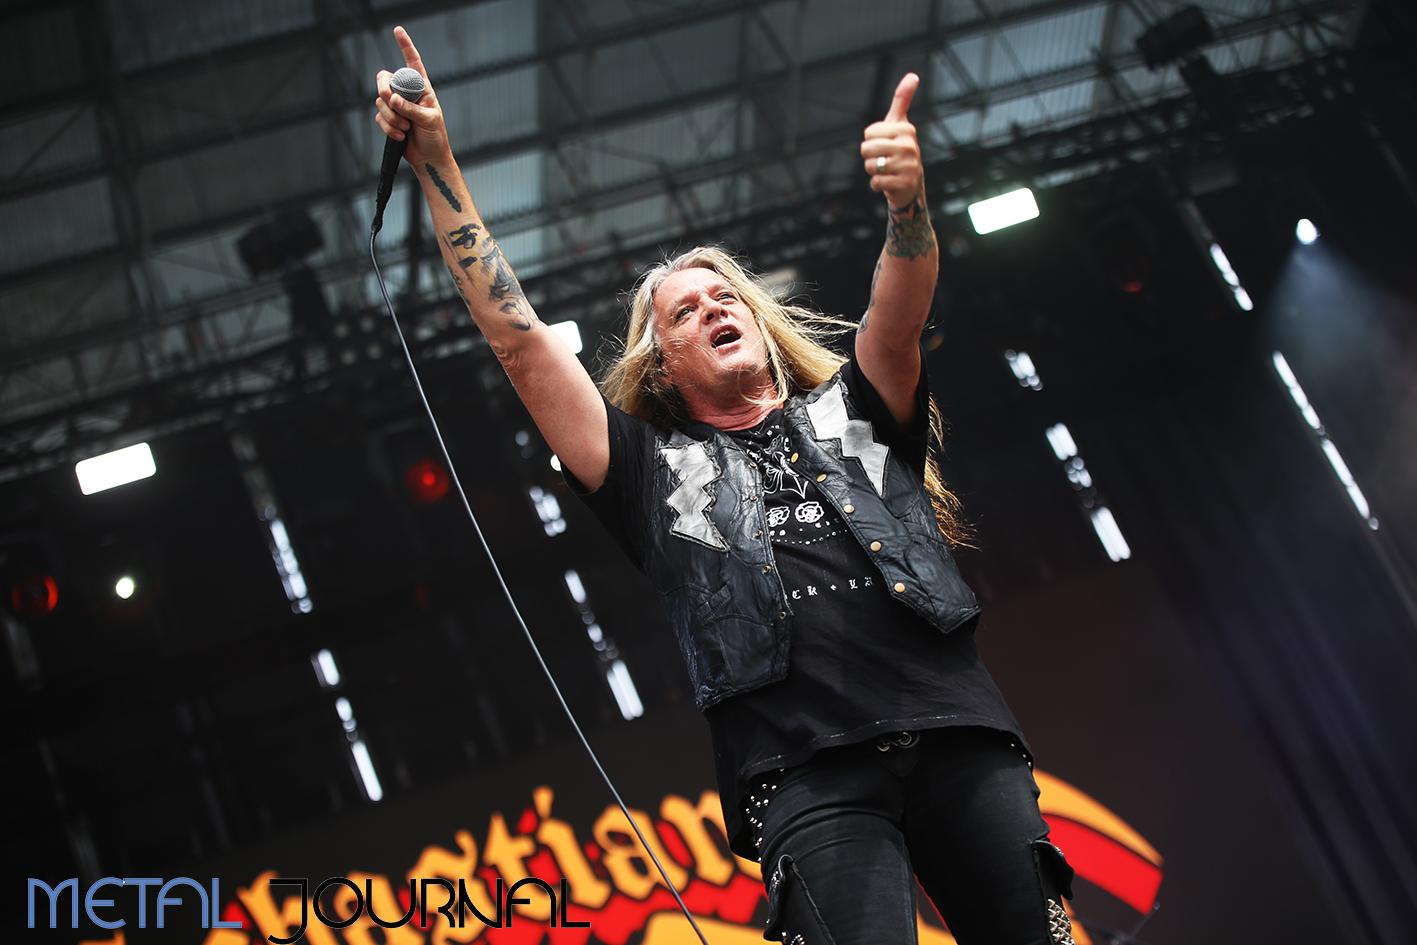 sebastian bach - metal journal rock fest barcelona 2019 pic 4